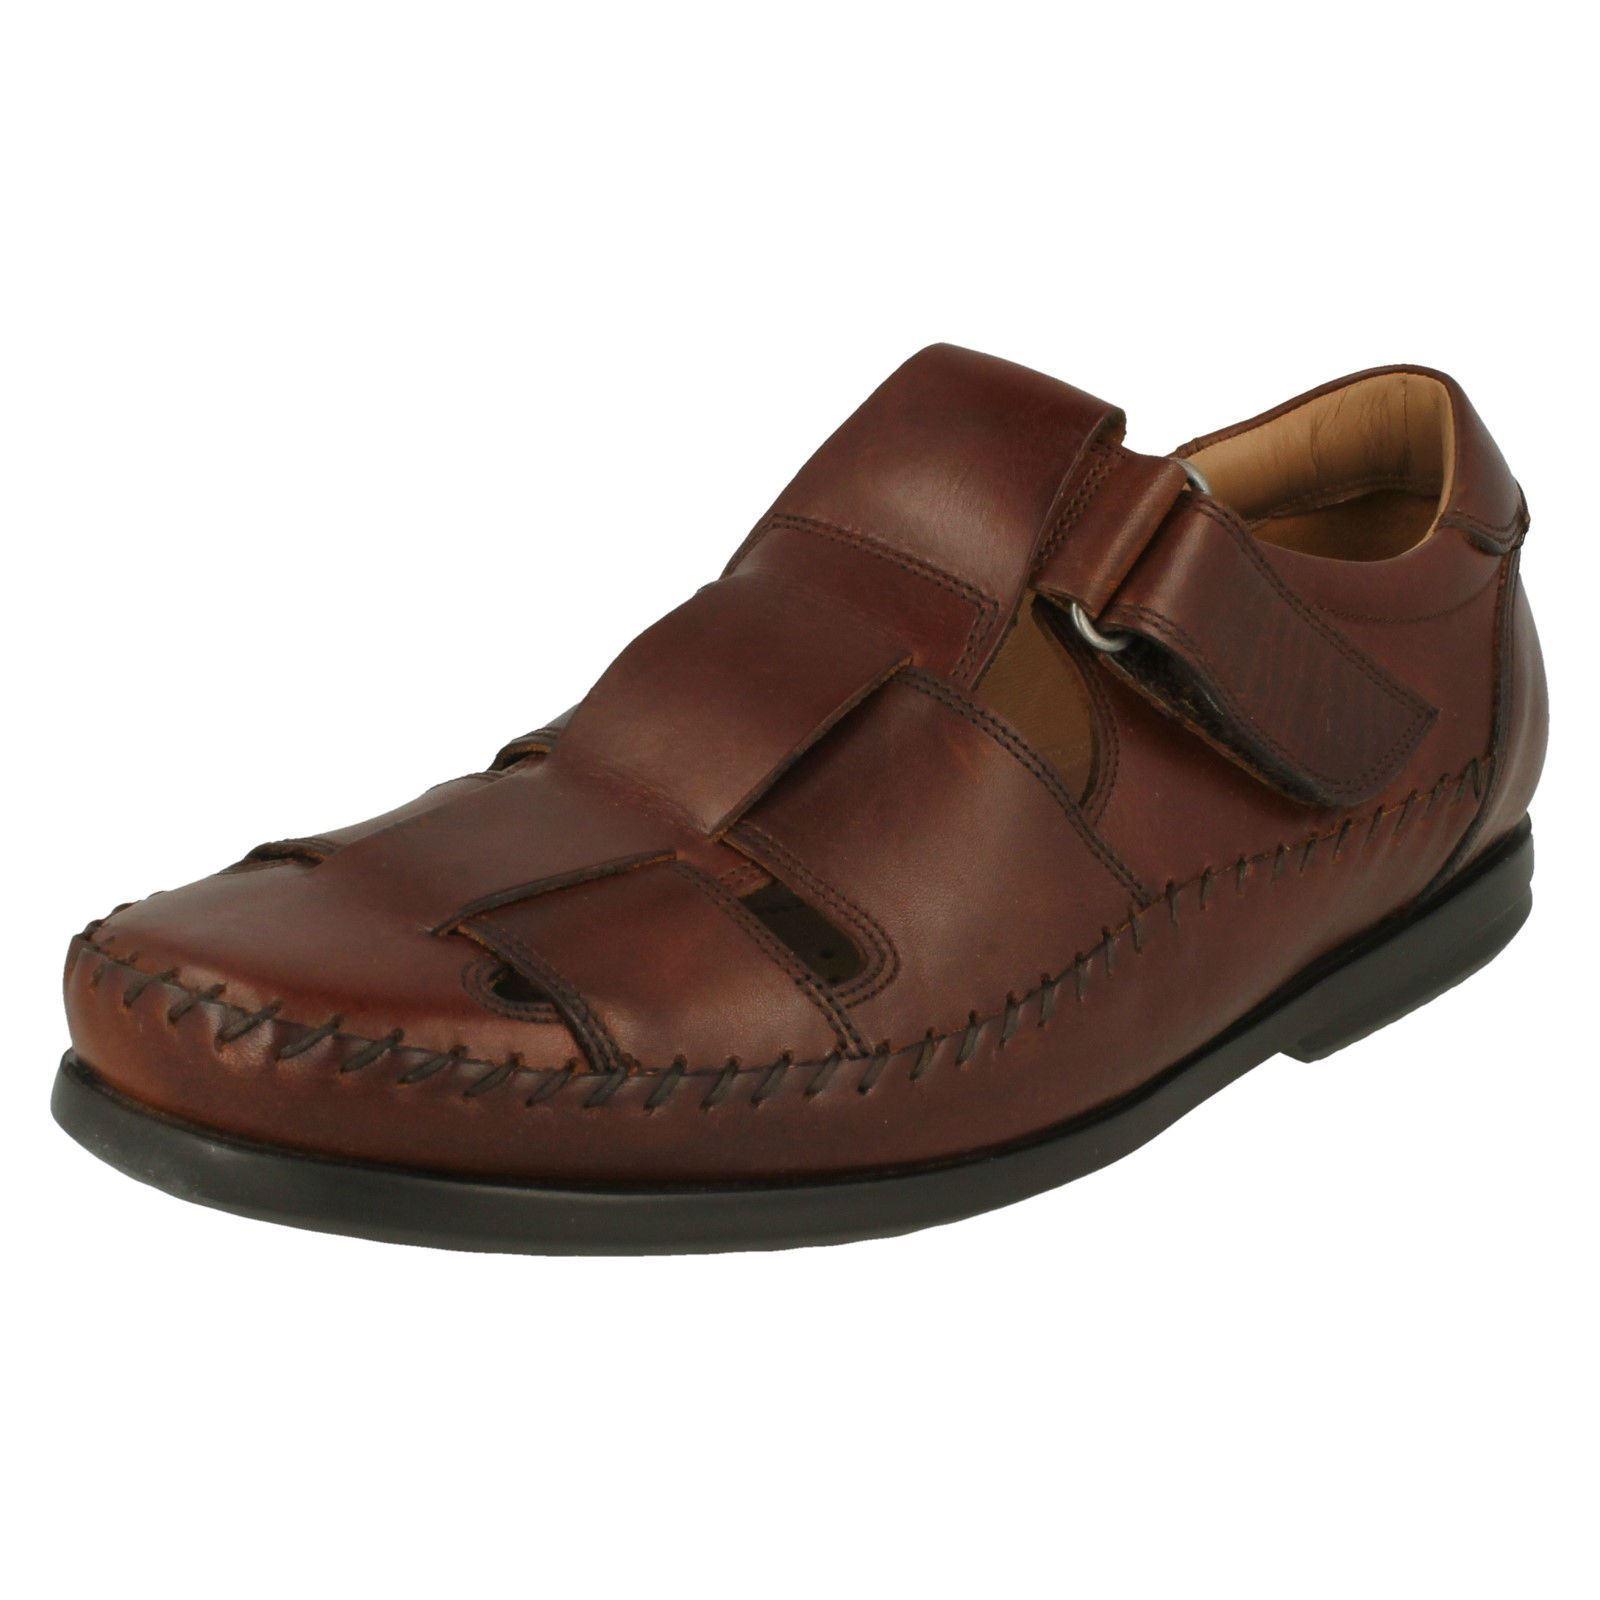 Mens Clarks Strapped Sandals Un Gala Strap    | Professionelles Design